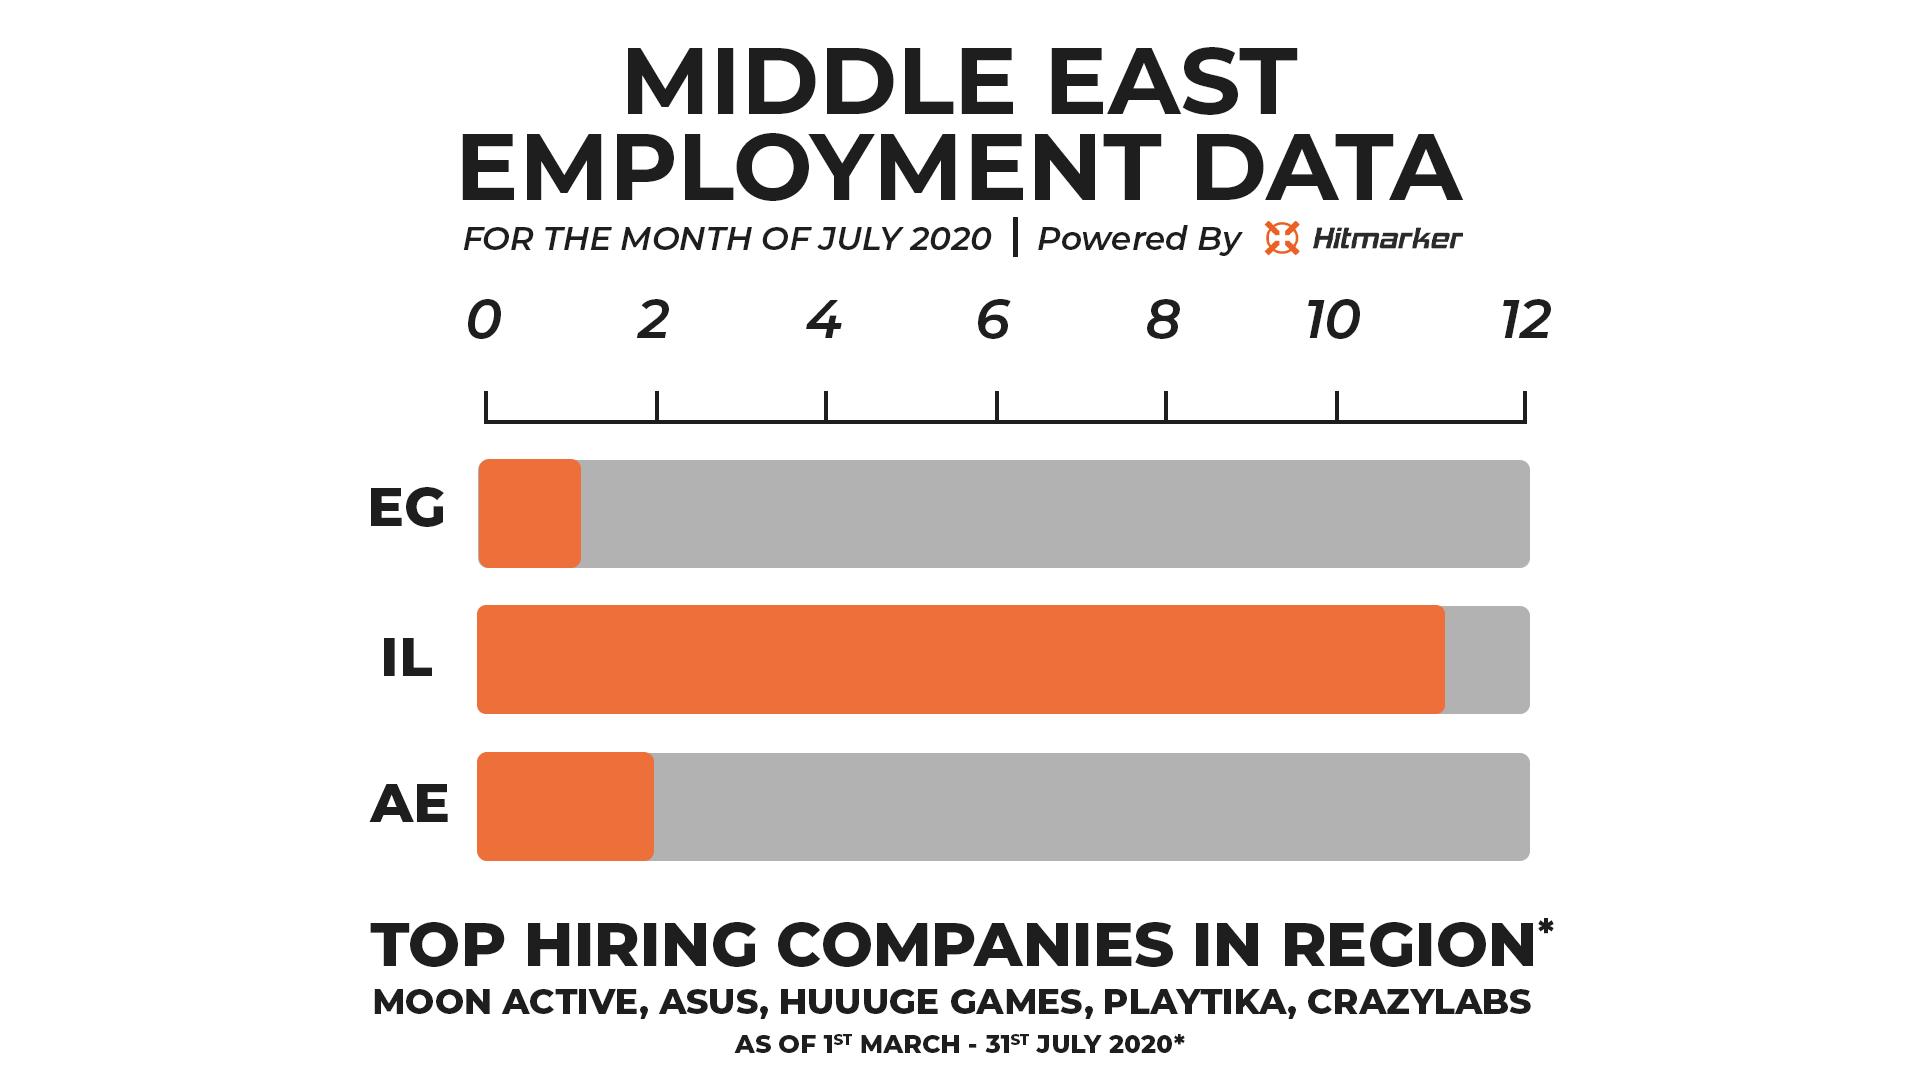 Hitmarker Employment Data Middle East